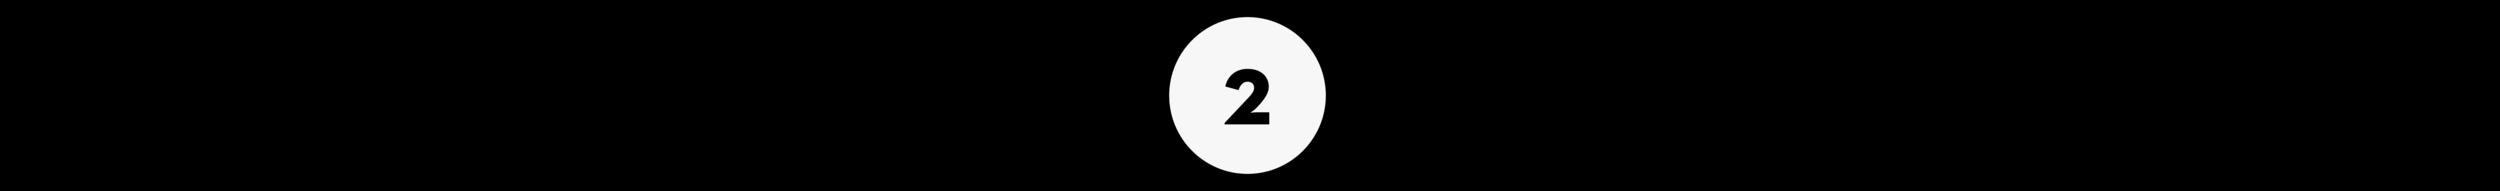 LineBreak 01 (2).png